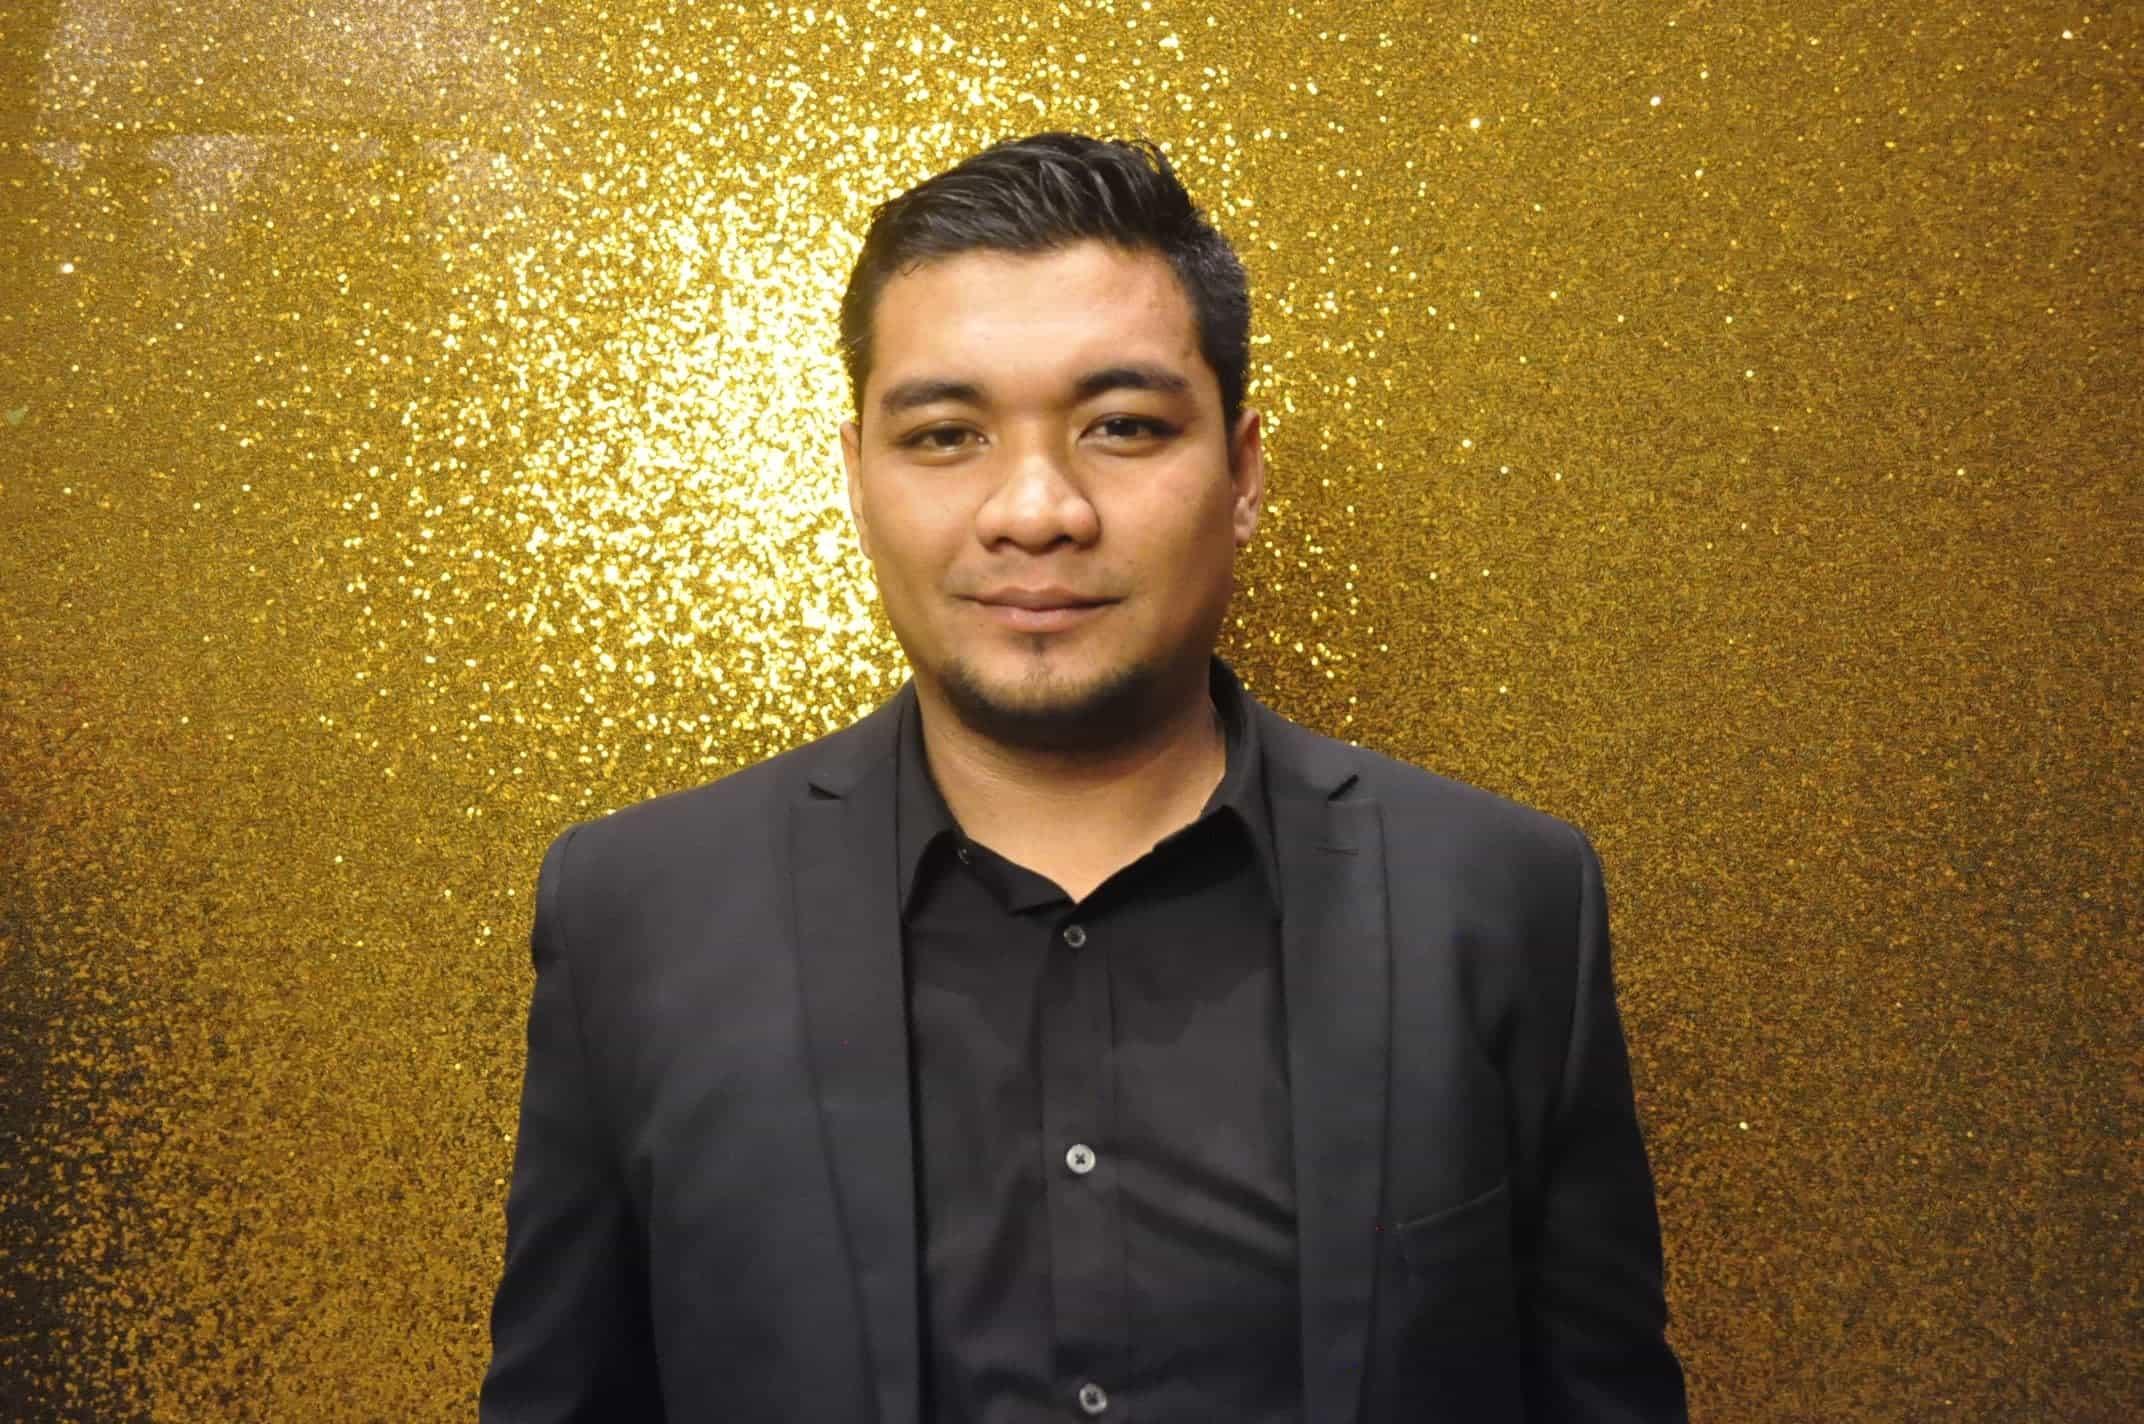 Malam Gala Anggun 2018 (Photobooth) 13